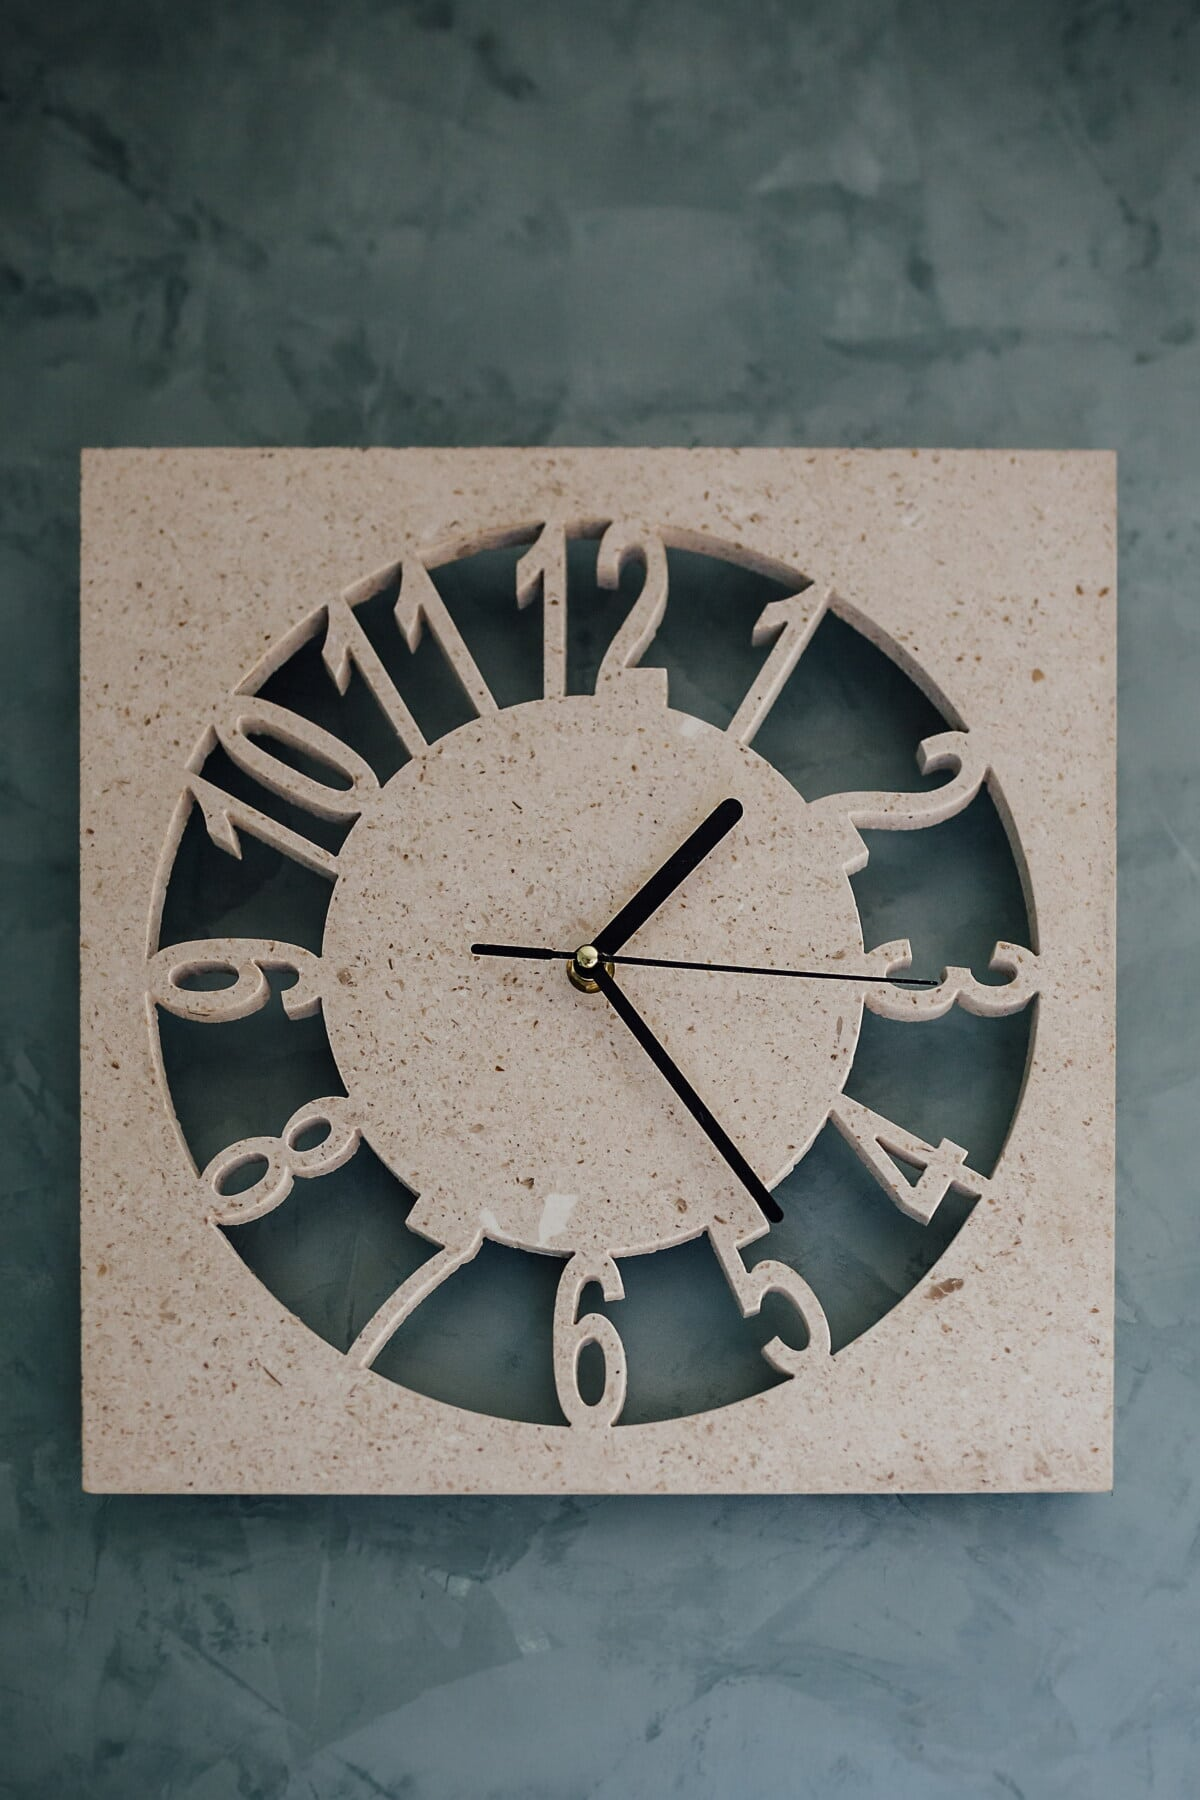 analog clock, stone, marble, interior design, wall, time, fancy, clock, instrument, retro